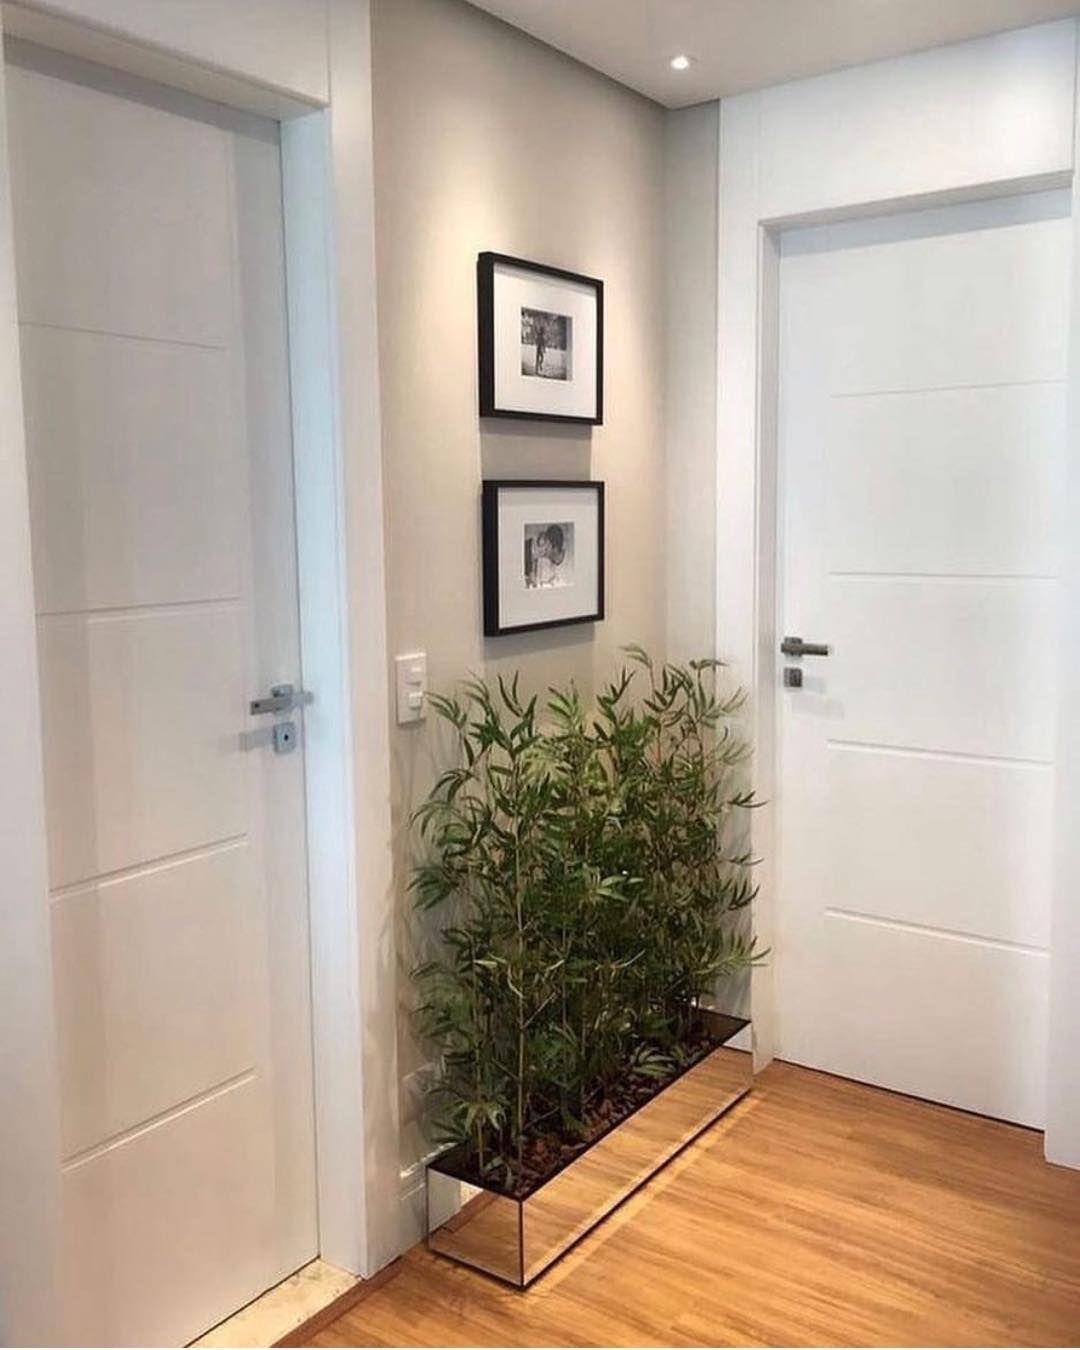 New The 10 Best Home Decor With Pictures تفصيل حسب الطلب بدقة فائقة وجودة عالية Silver Living Room Decor Luxury Dining Room White Dining Room Decor